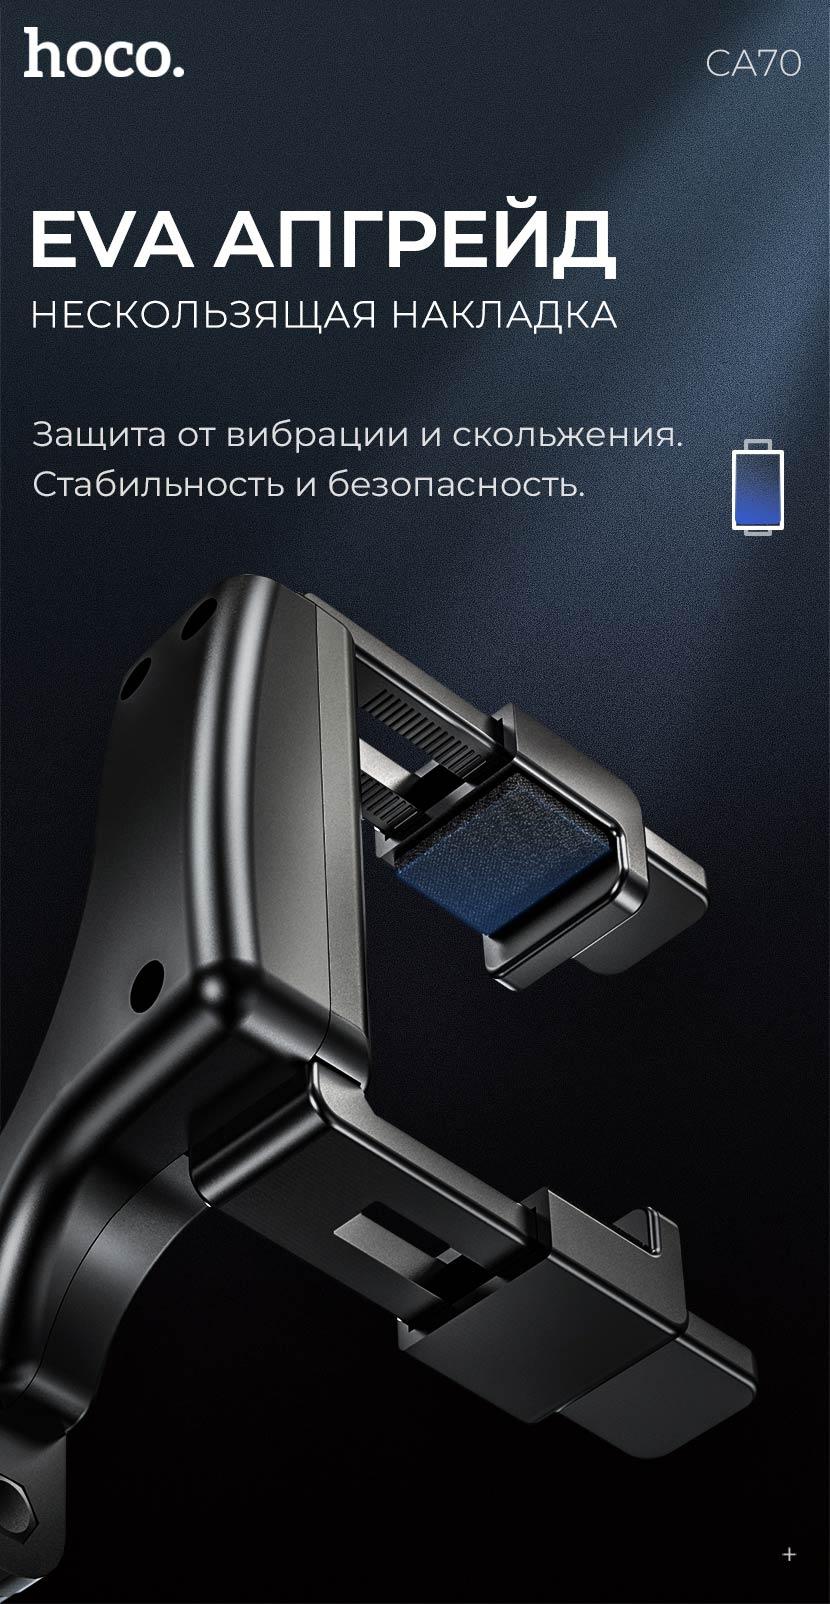 hoco news ca70 pilot in car rearview mirror mount holder non slip ru